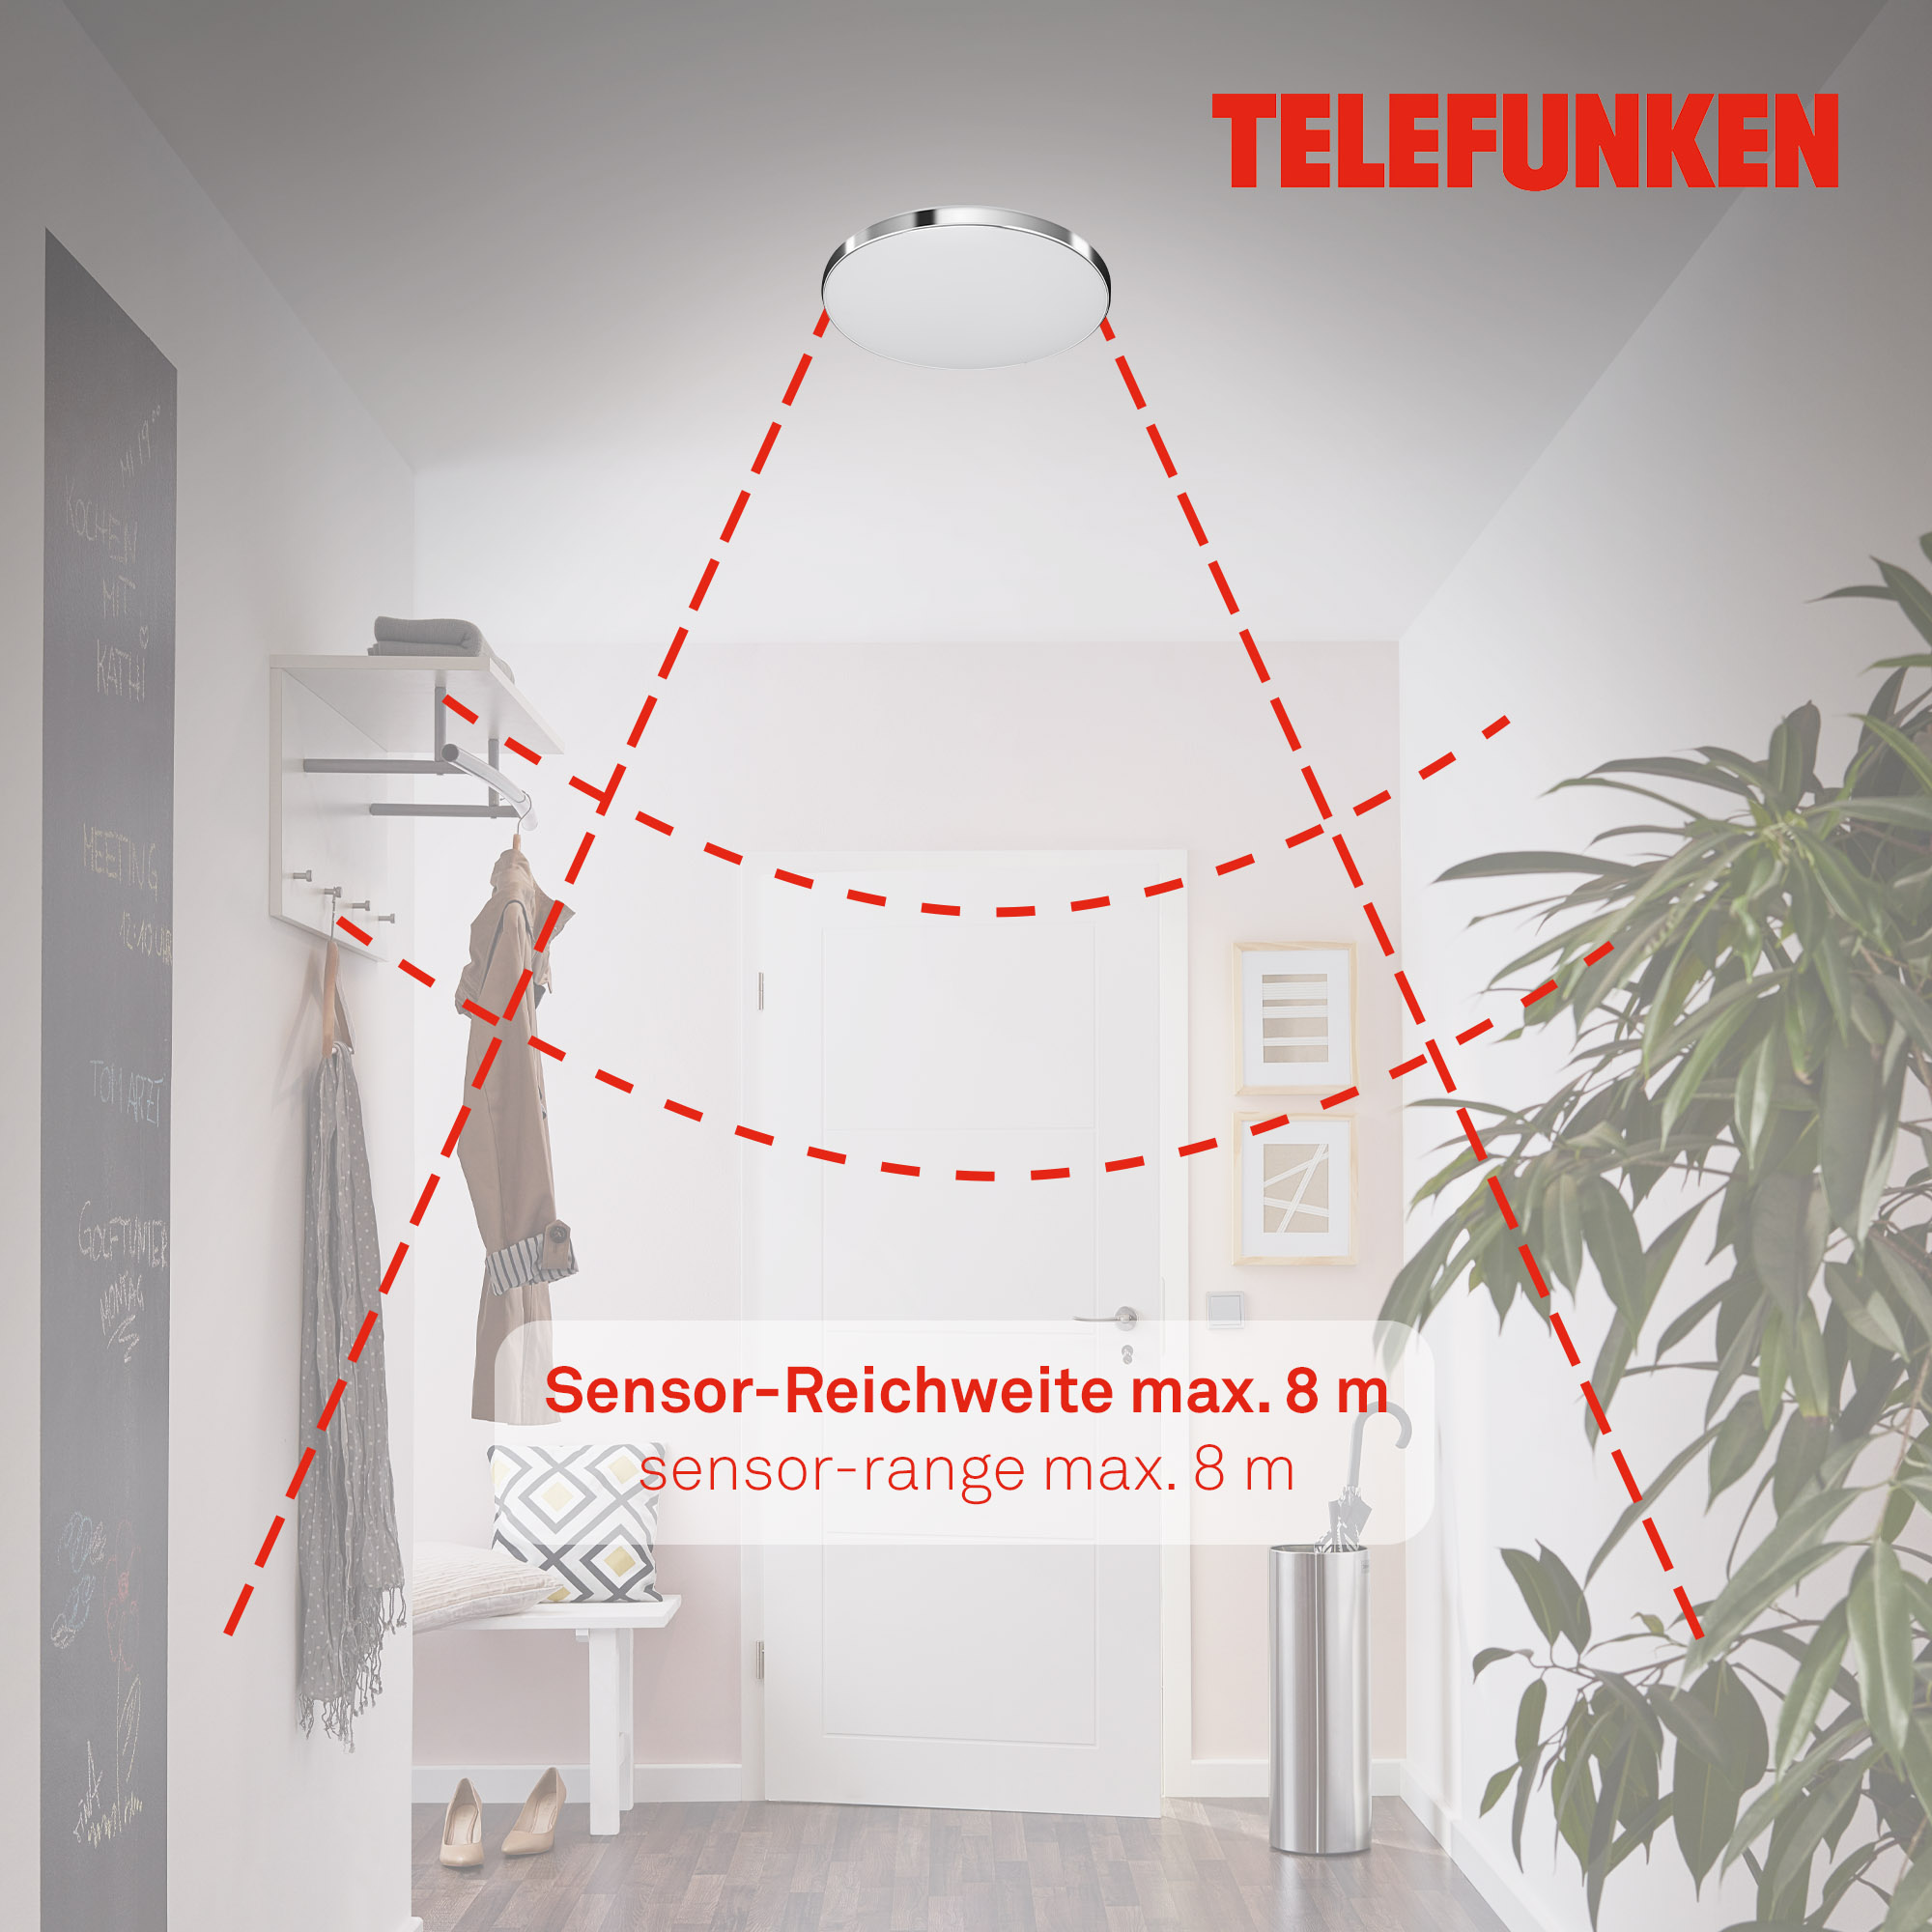 TELEFUNKEN Sensor LED Deckenleuchte, Ø 29 cm, 16 W, Weiß-Chrom